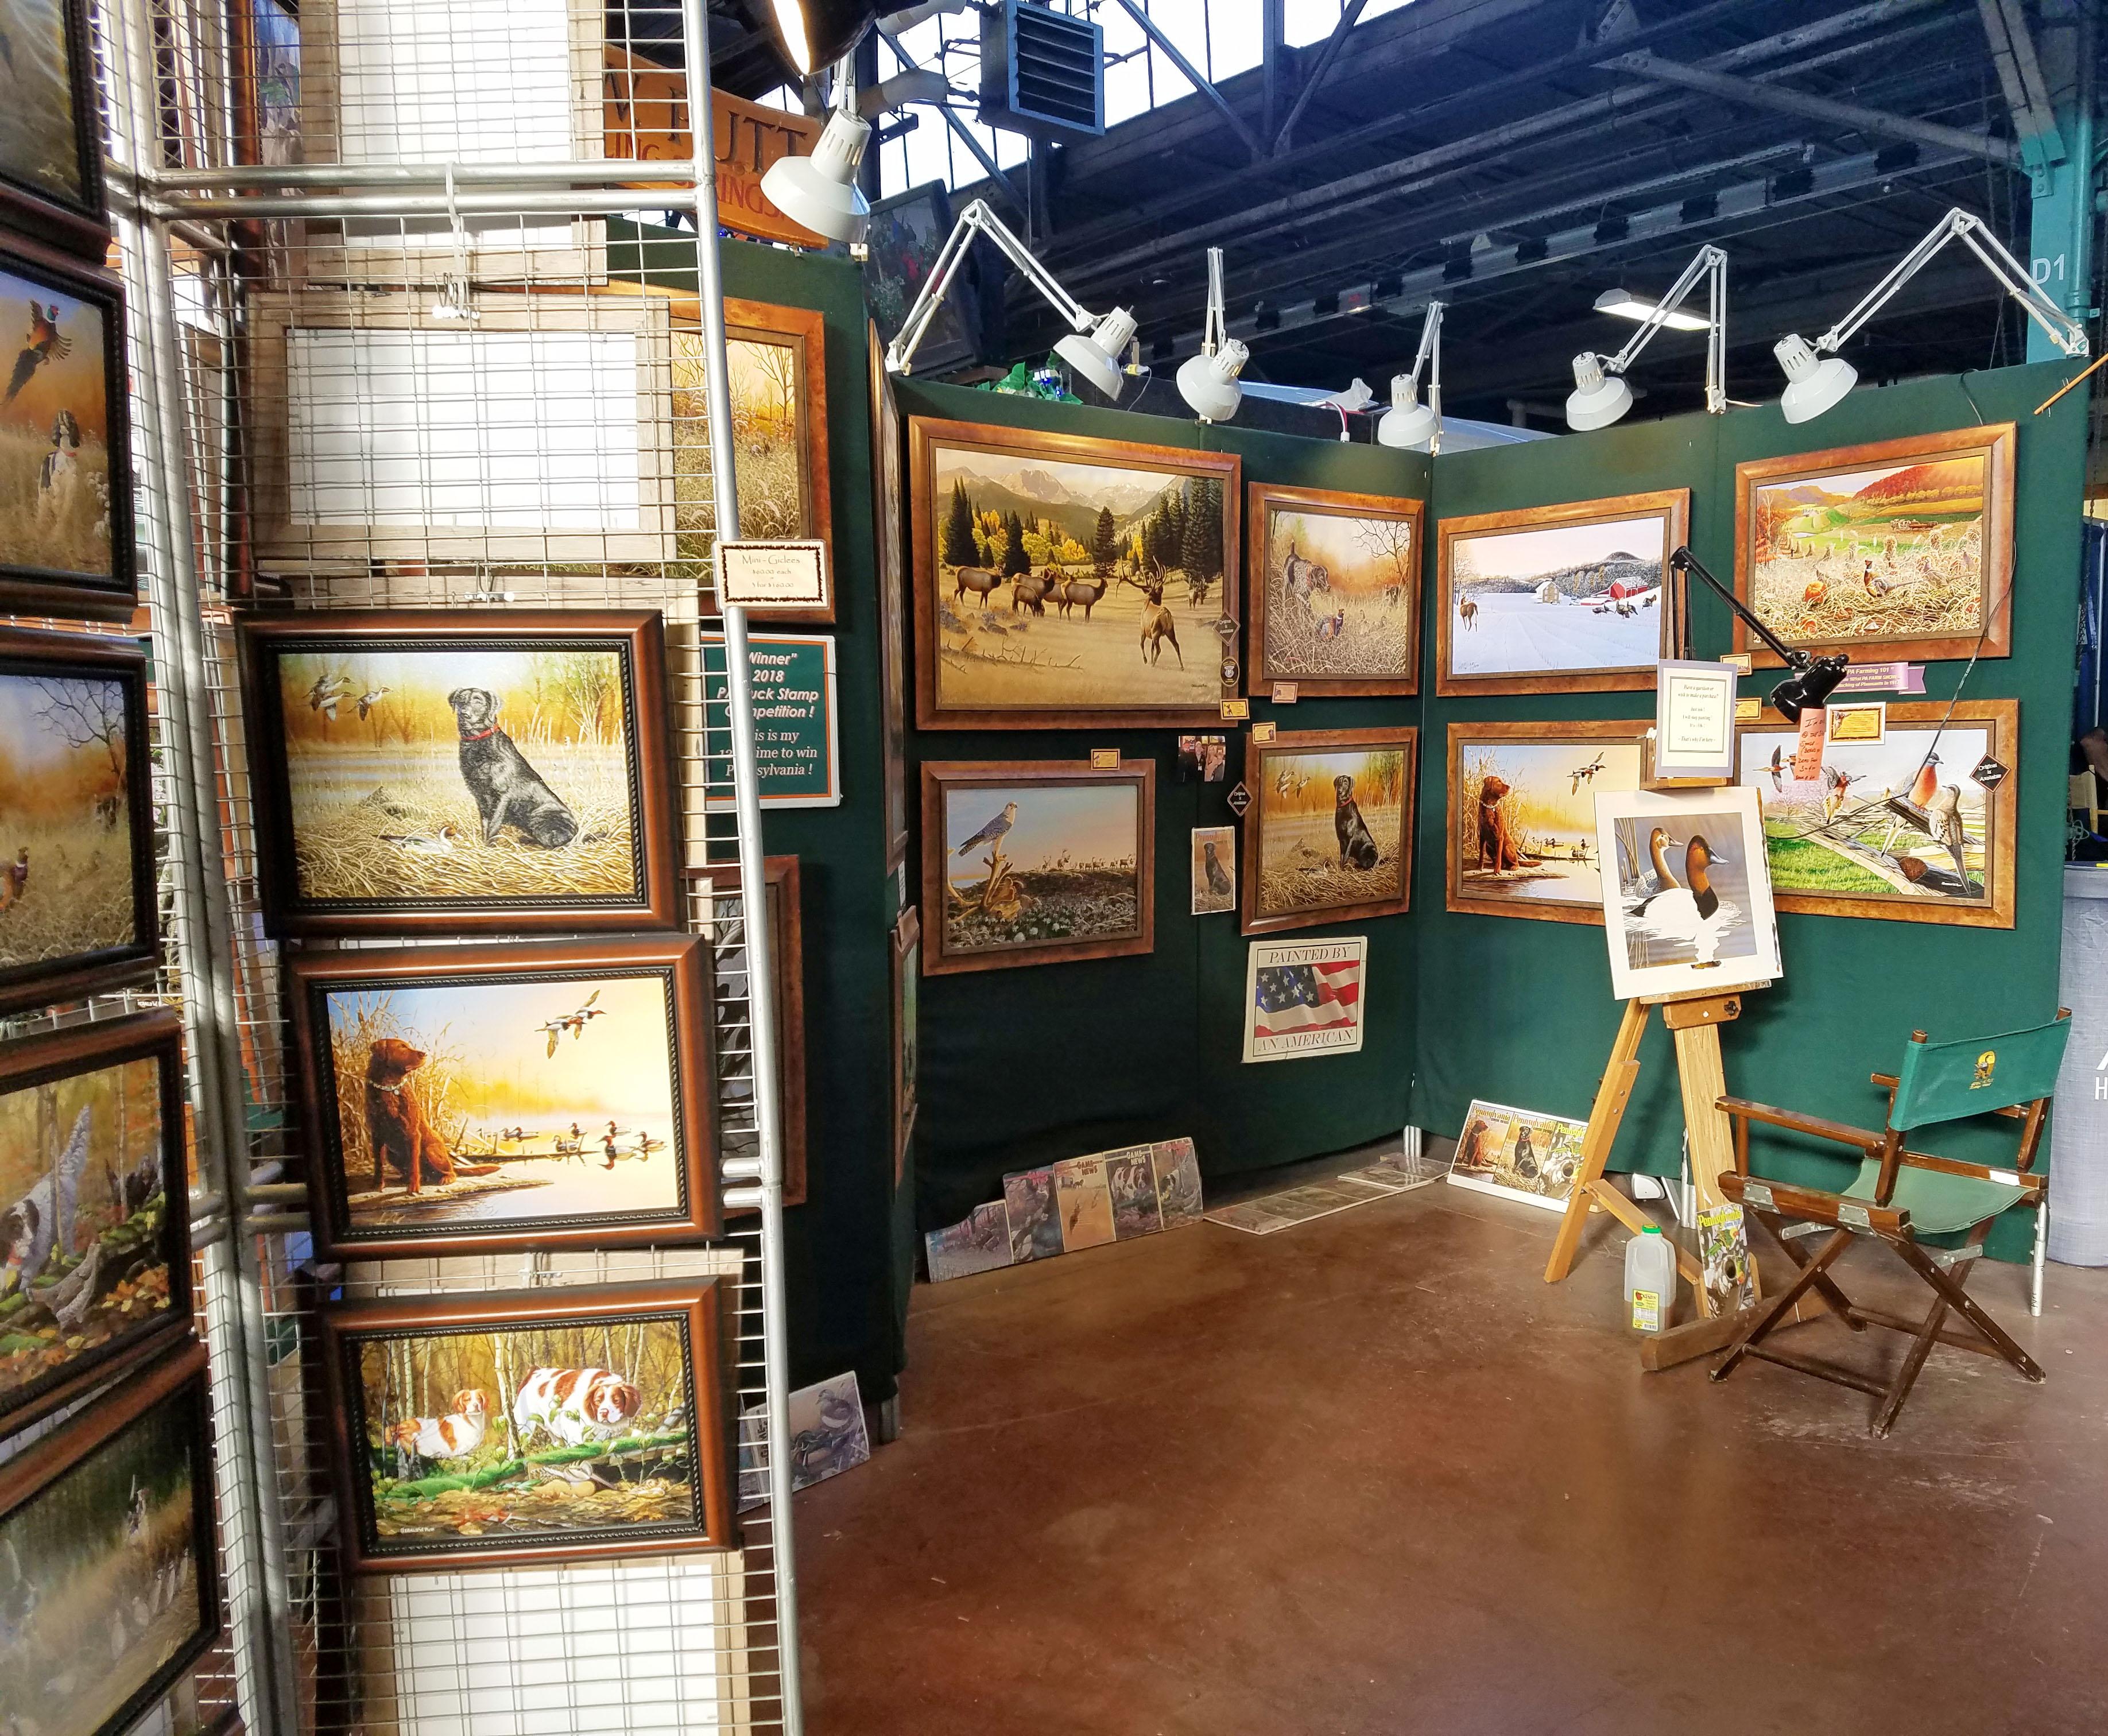 Dorable Craigslist Farm And Garden Kentucky Festooning - Brown ...